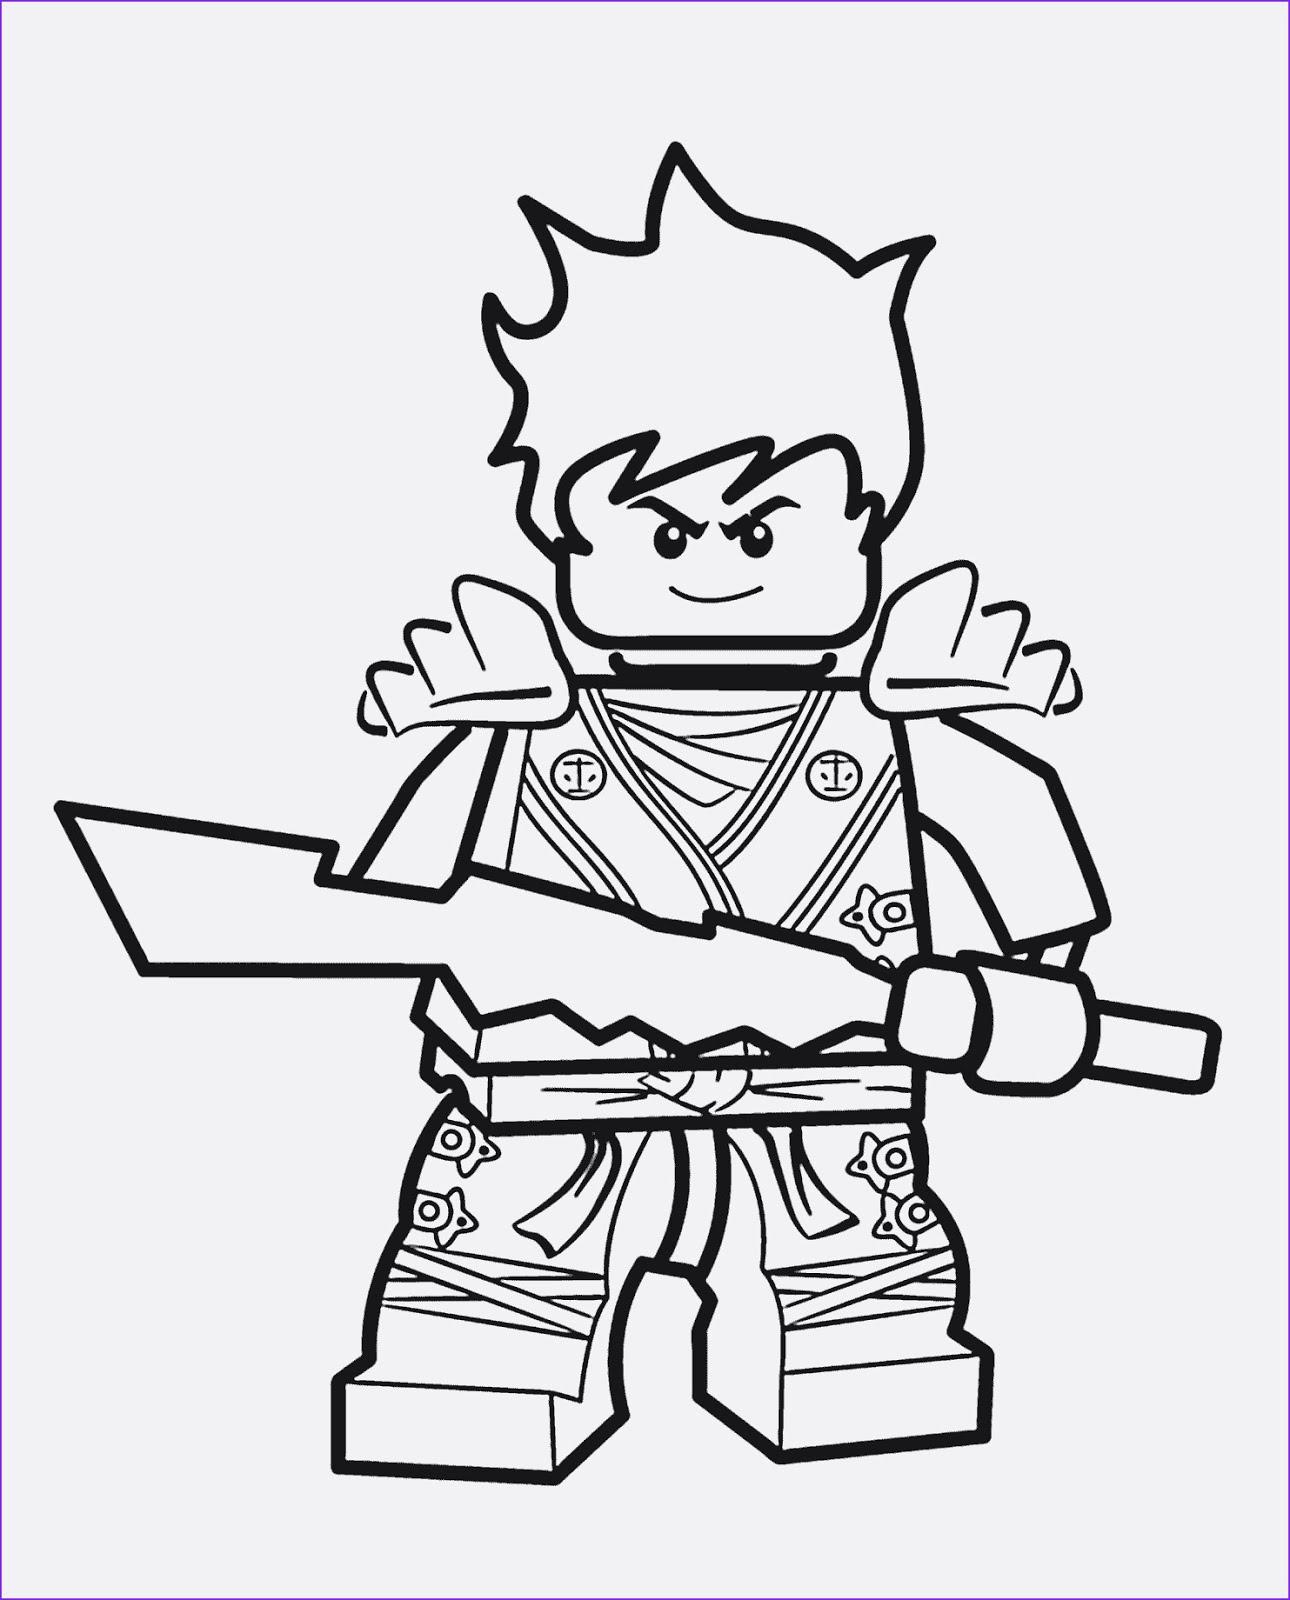 Ausmalbilder Lego Ninjago   Lego Ninjago zum Ausmalen ...